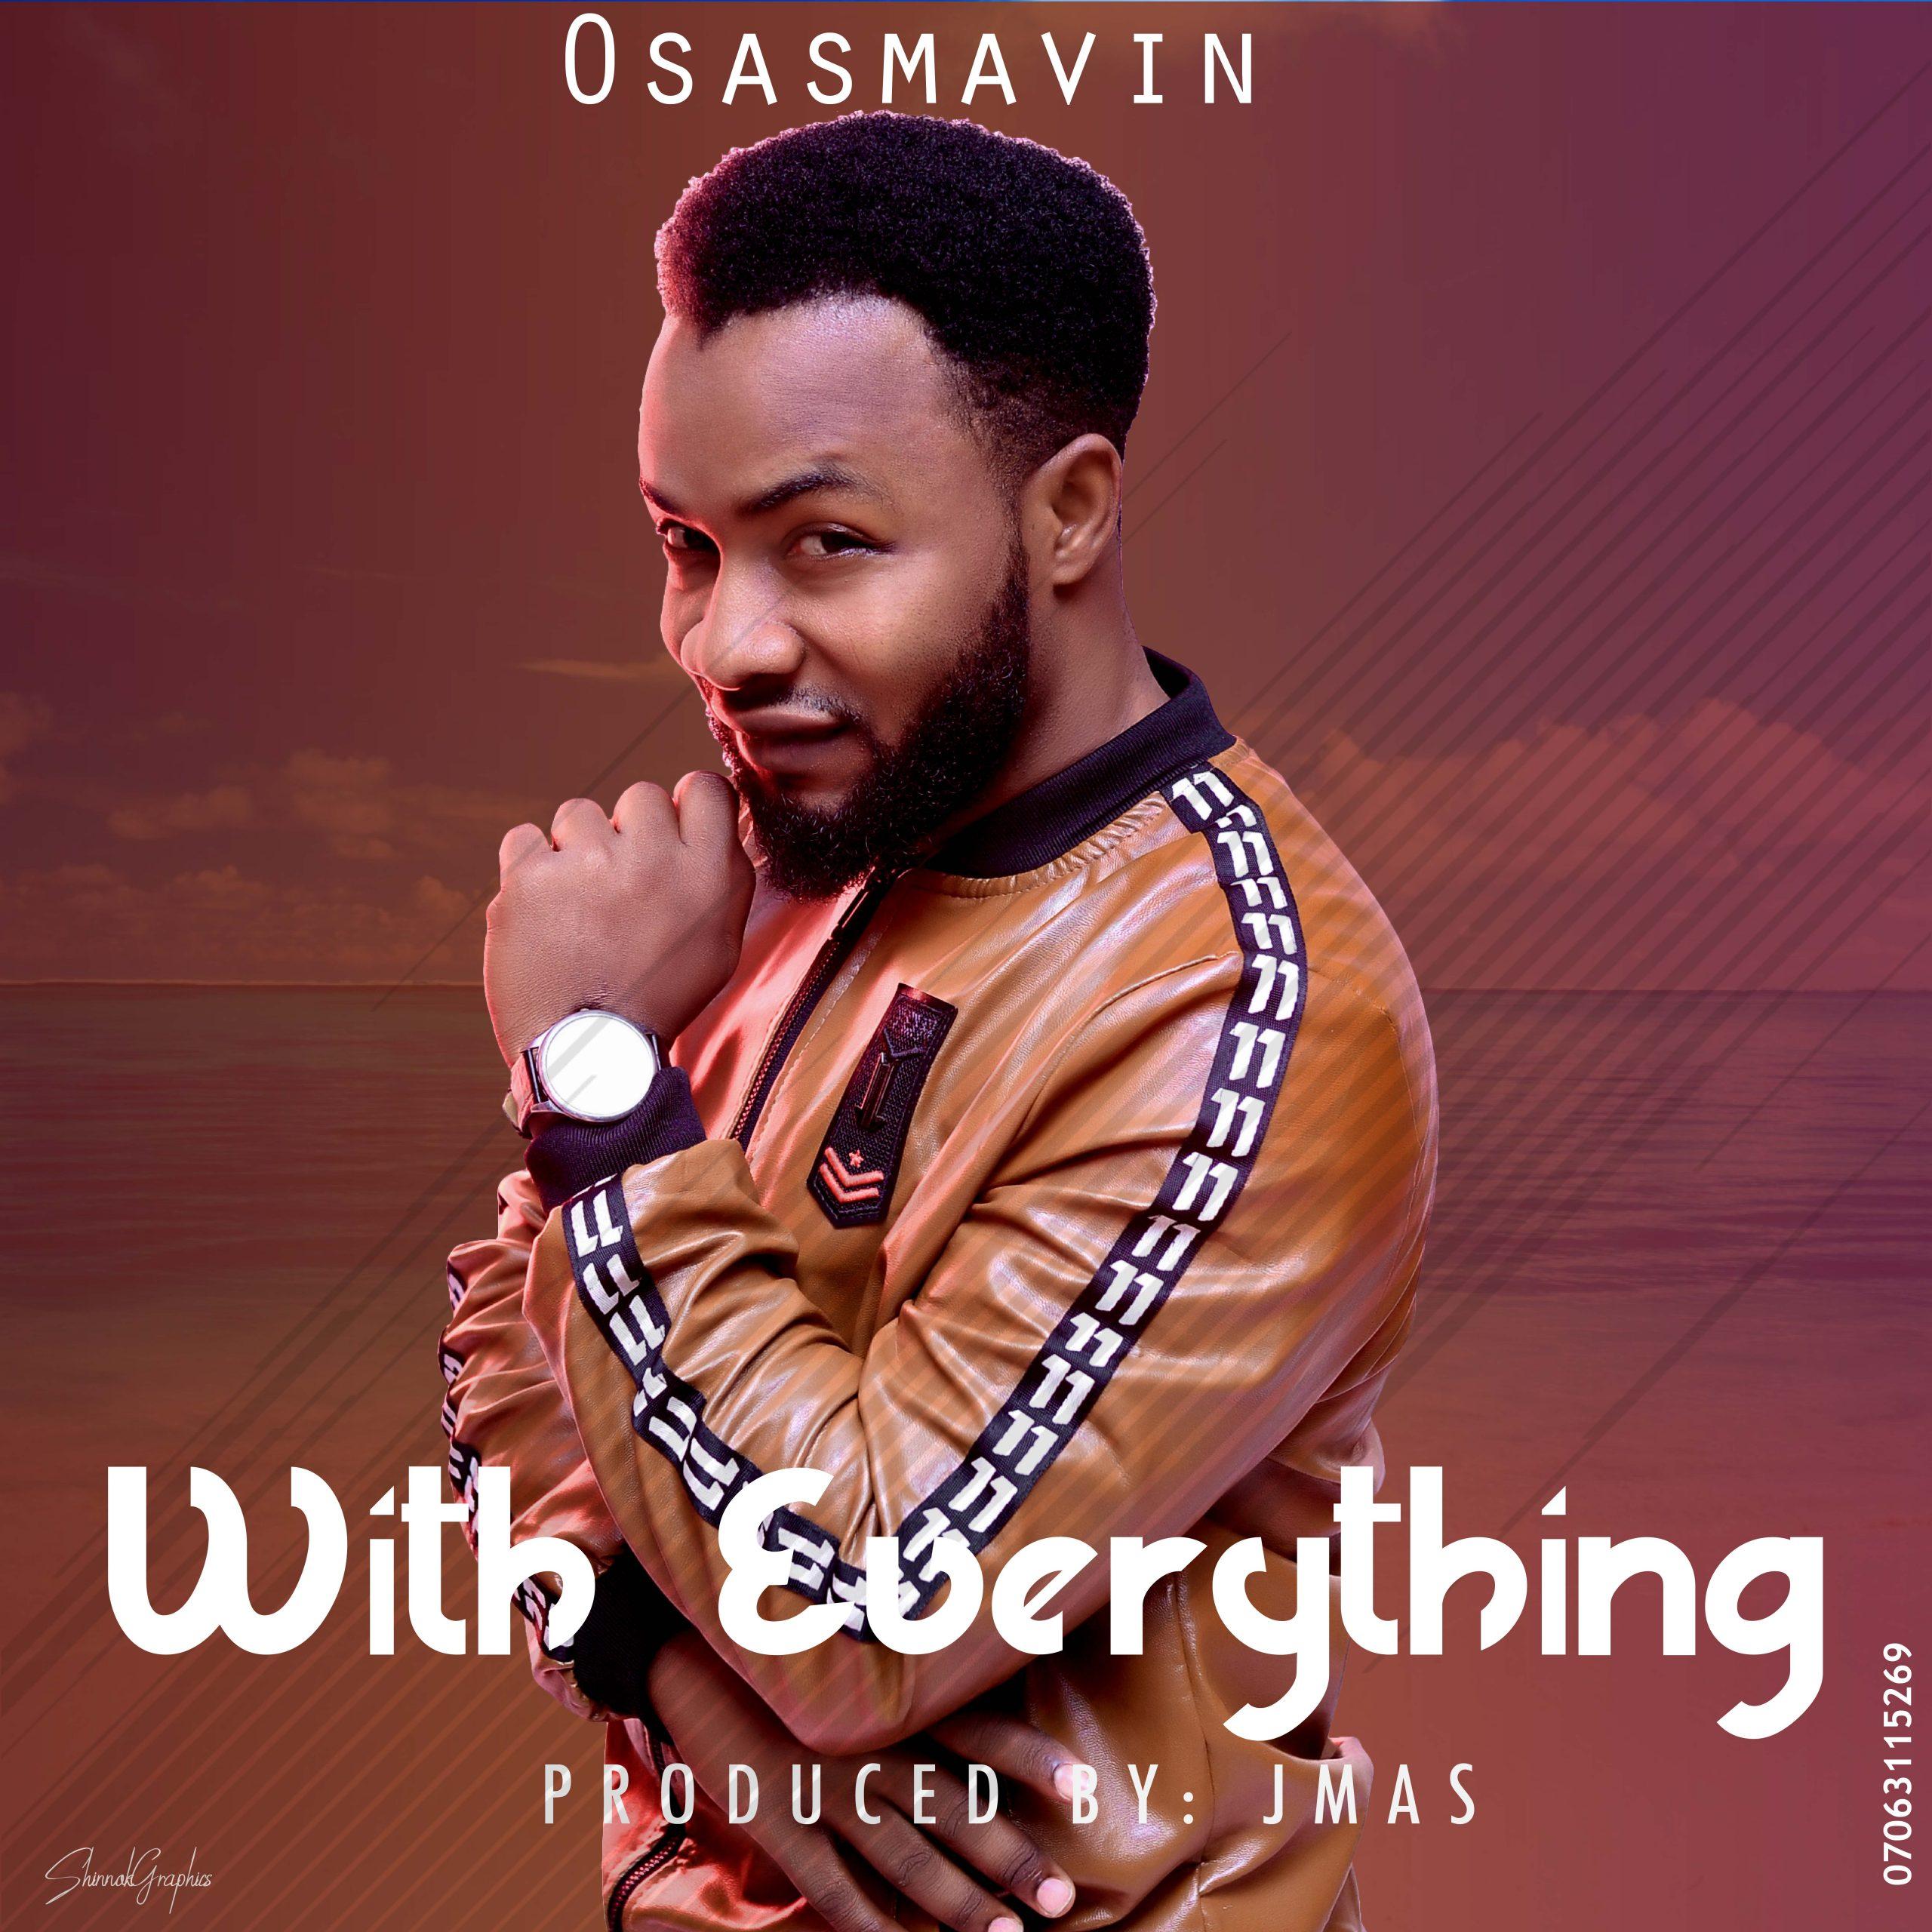 Osasmavin - with everything